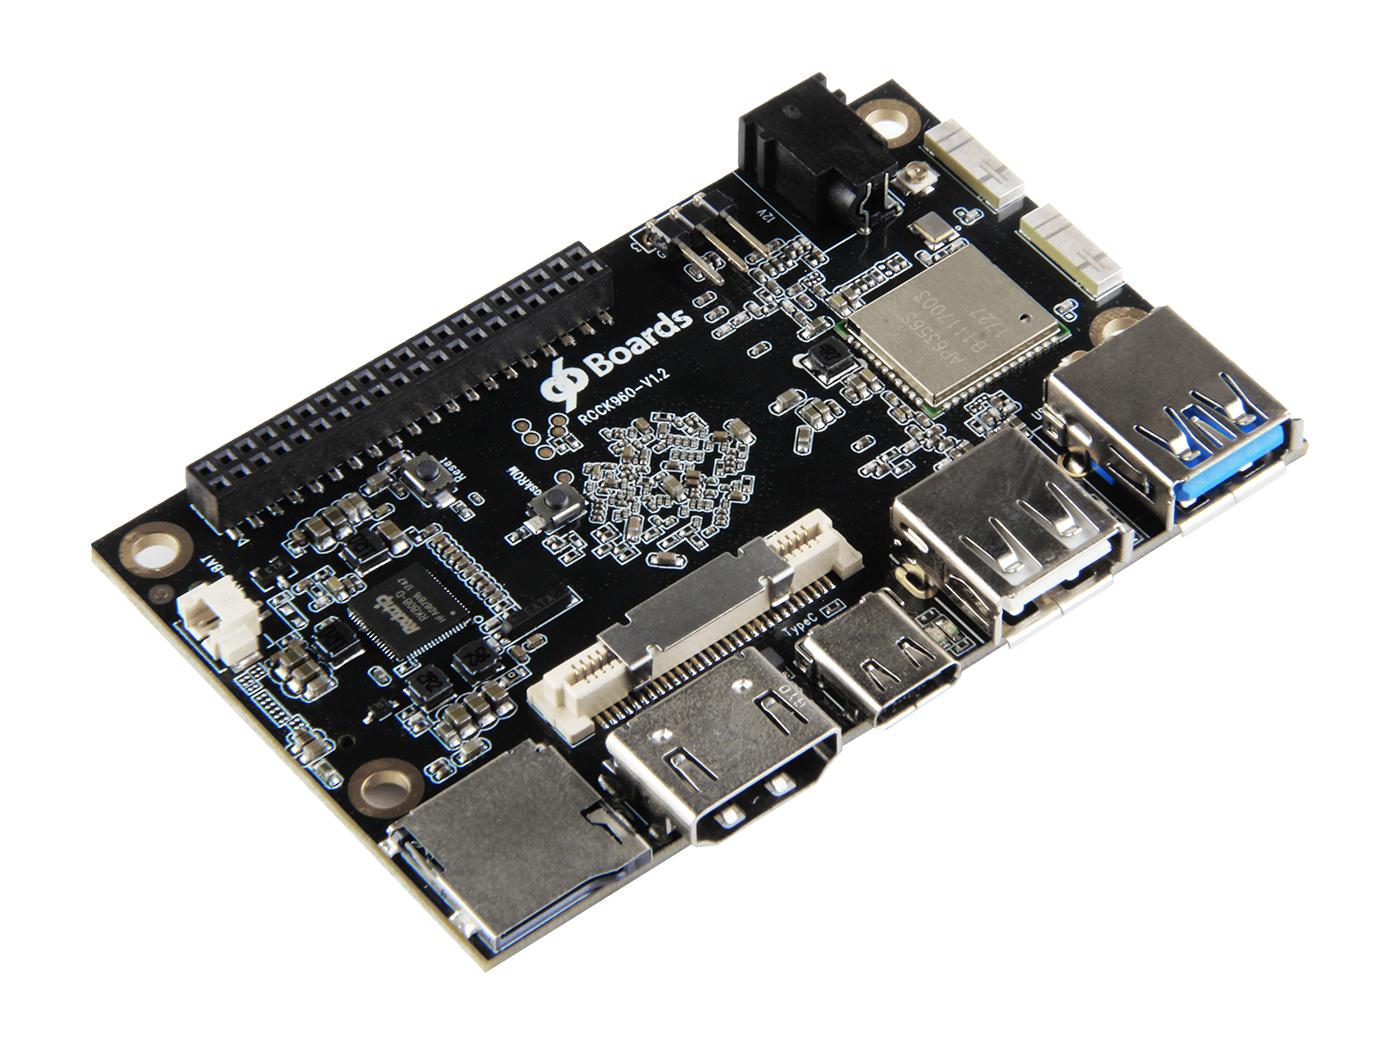 Rock960 Board - Based on the RK3399 SoC - 4GB RAM Version